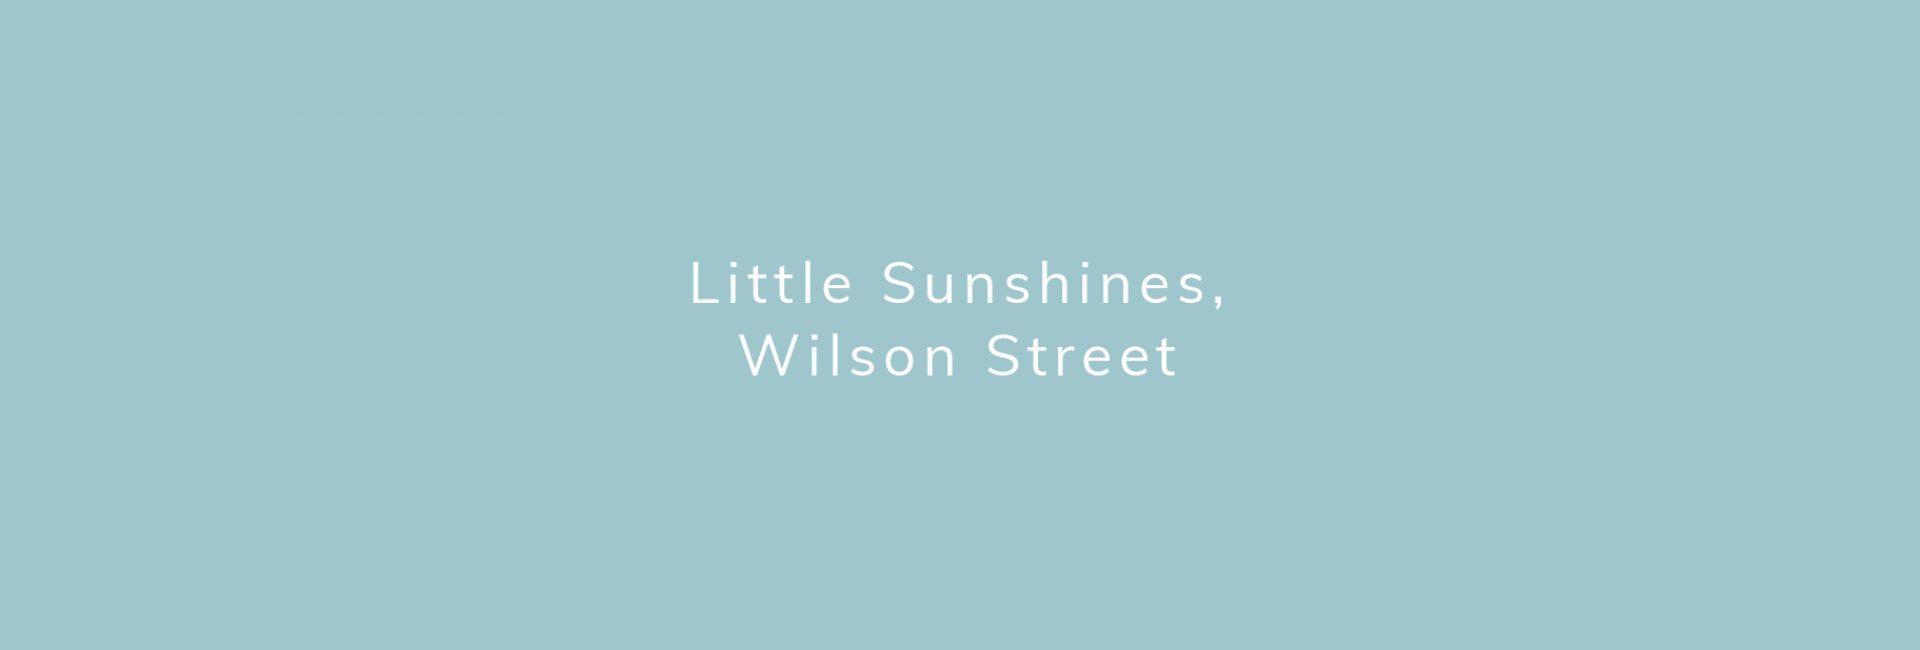 Wilson-Street